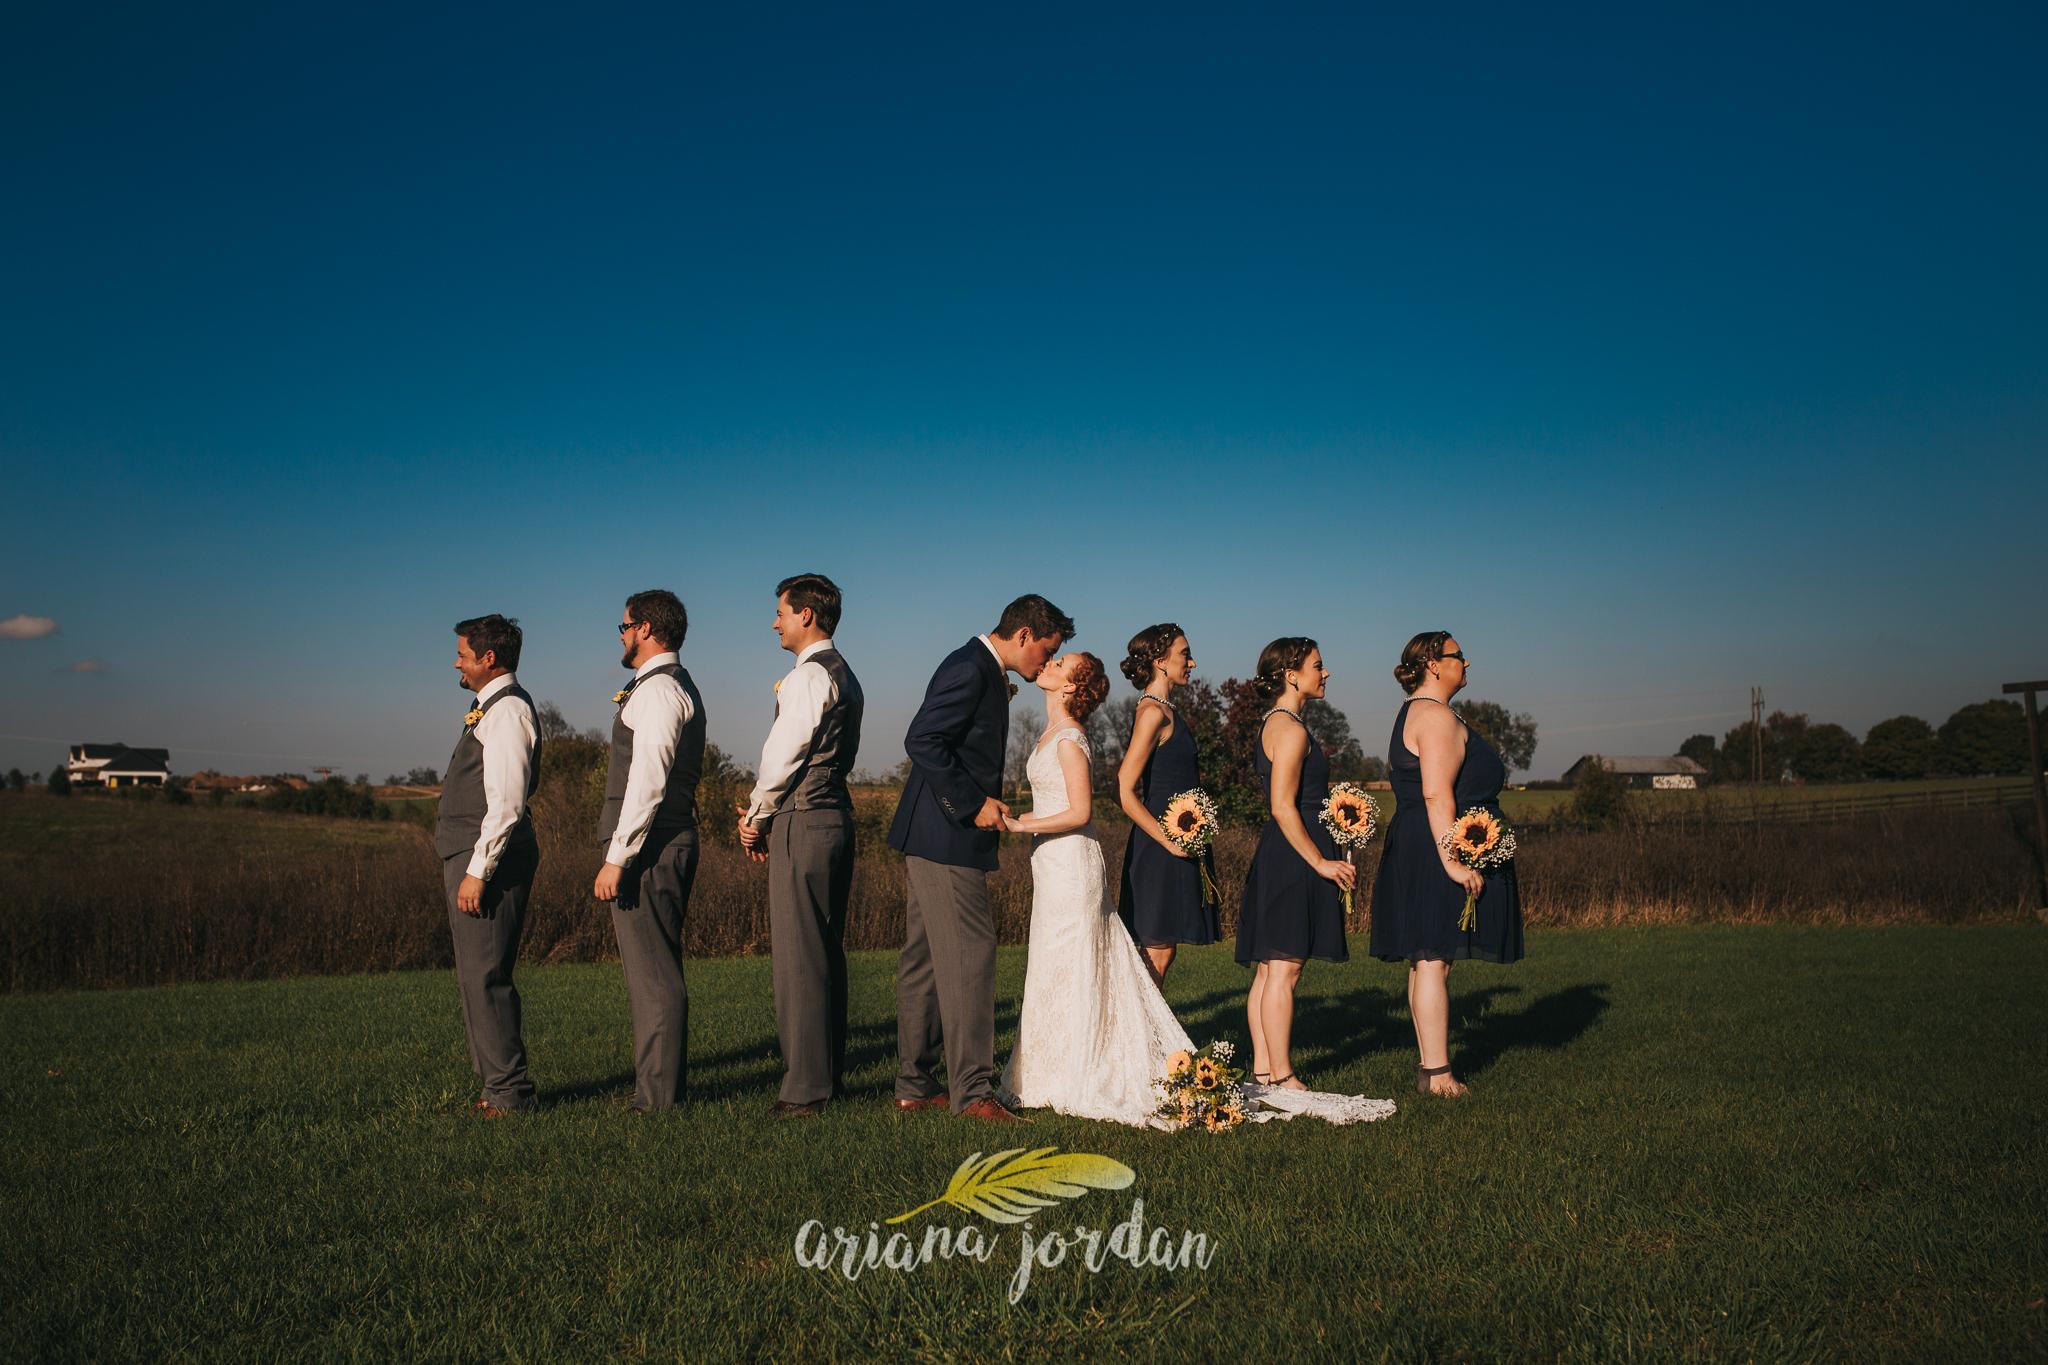 091 Ariana Jordan Photography -Moonlight Fields Lexington Ky Wedding Photographer 1835.jpg